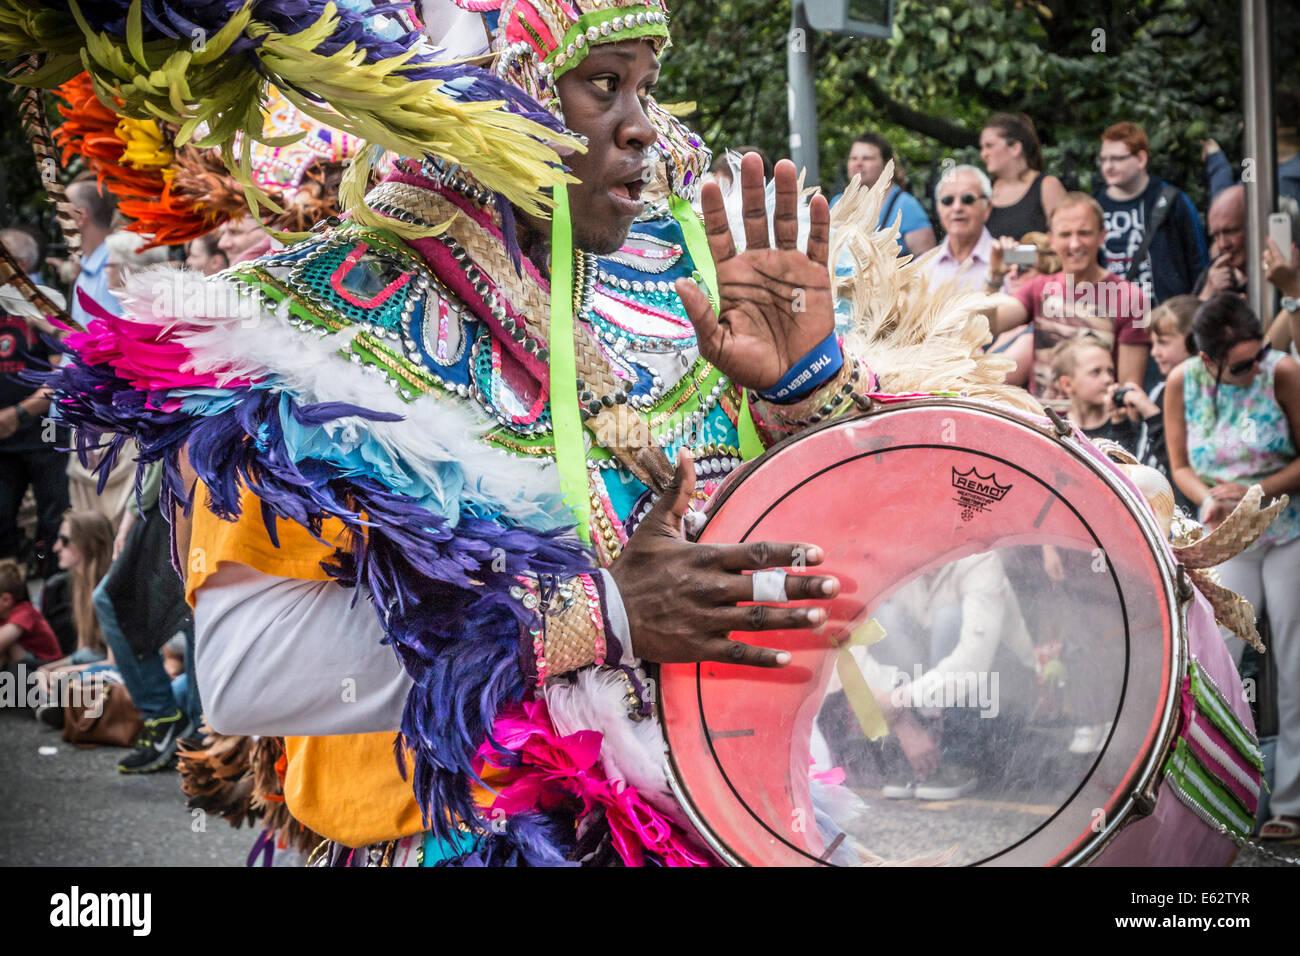 Edinburgh Jazz Festival and Carnival Parade 2014. Annual July event before the Edinburgh Festival and Fringe start. - Stock Image